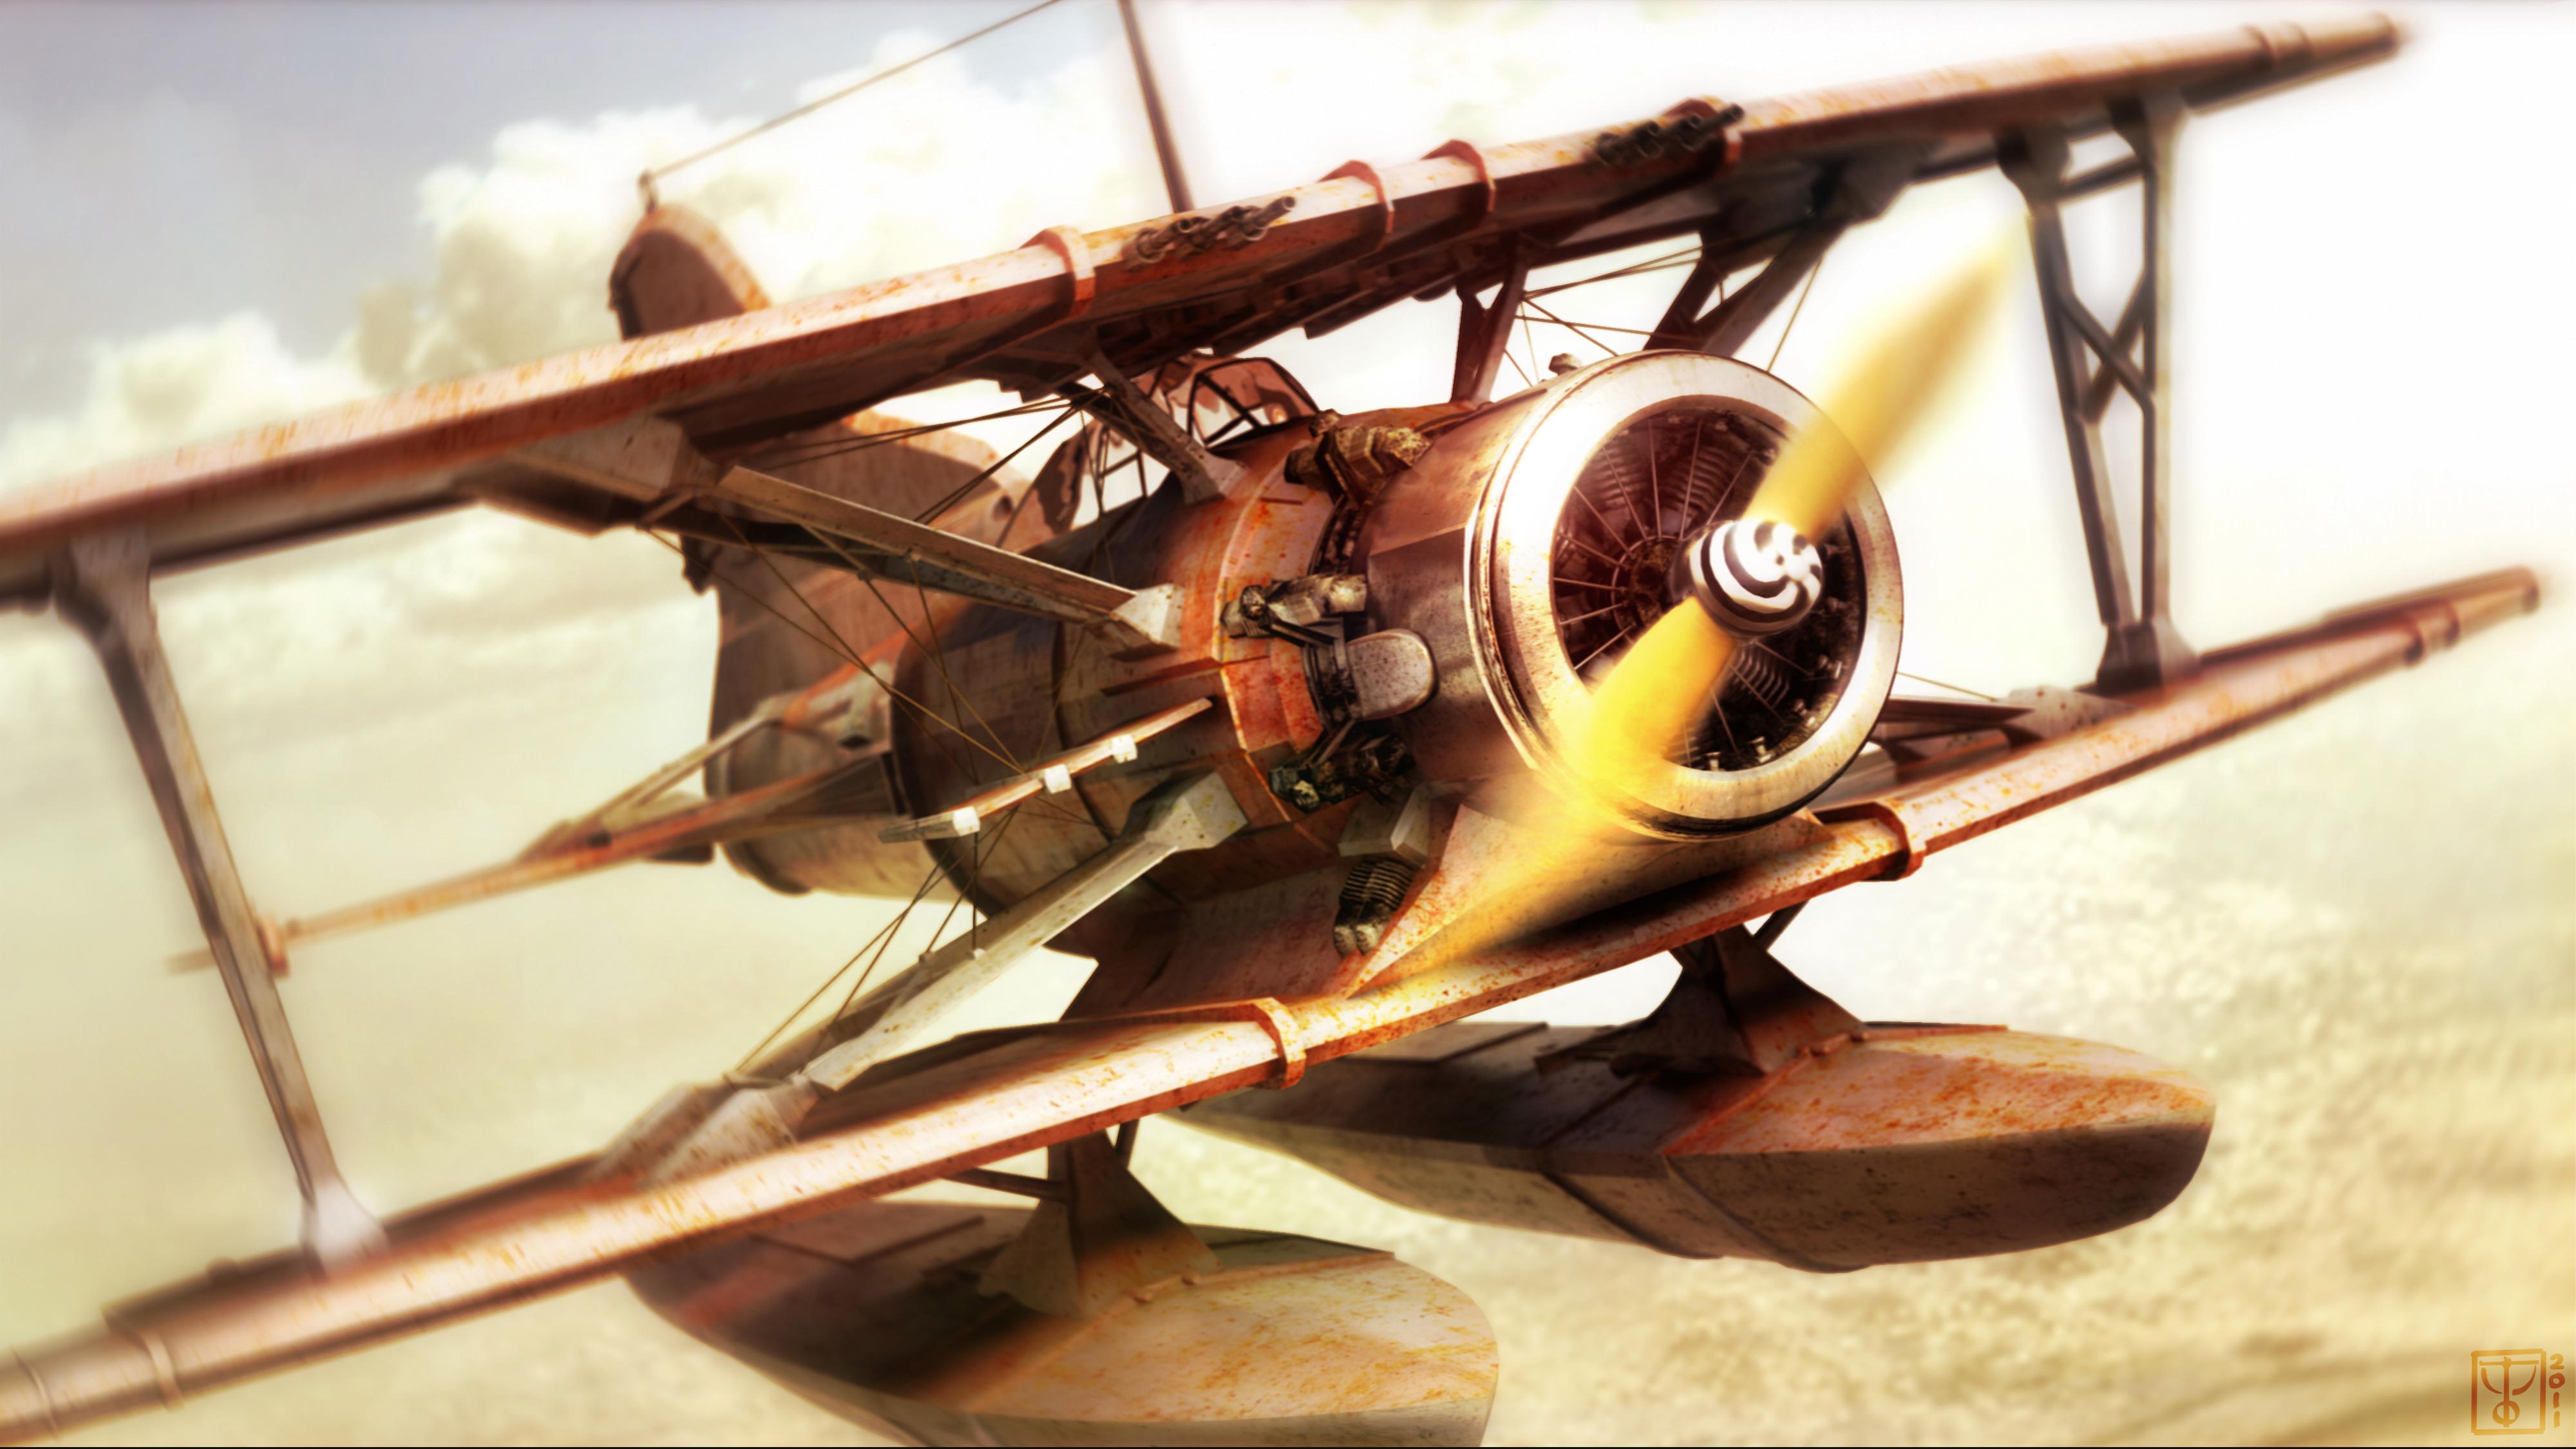 Chasing Plane.jpg